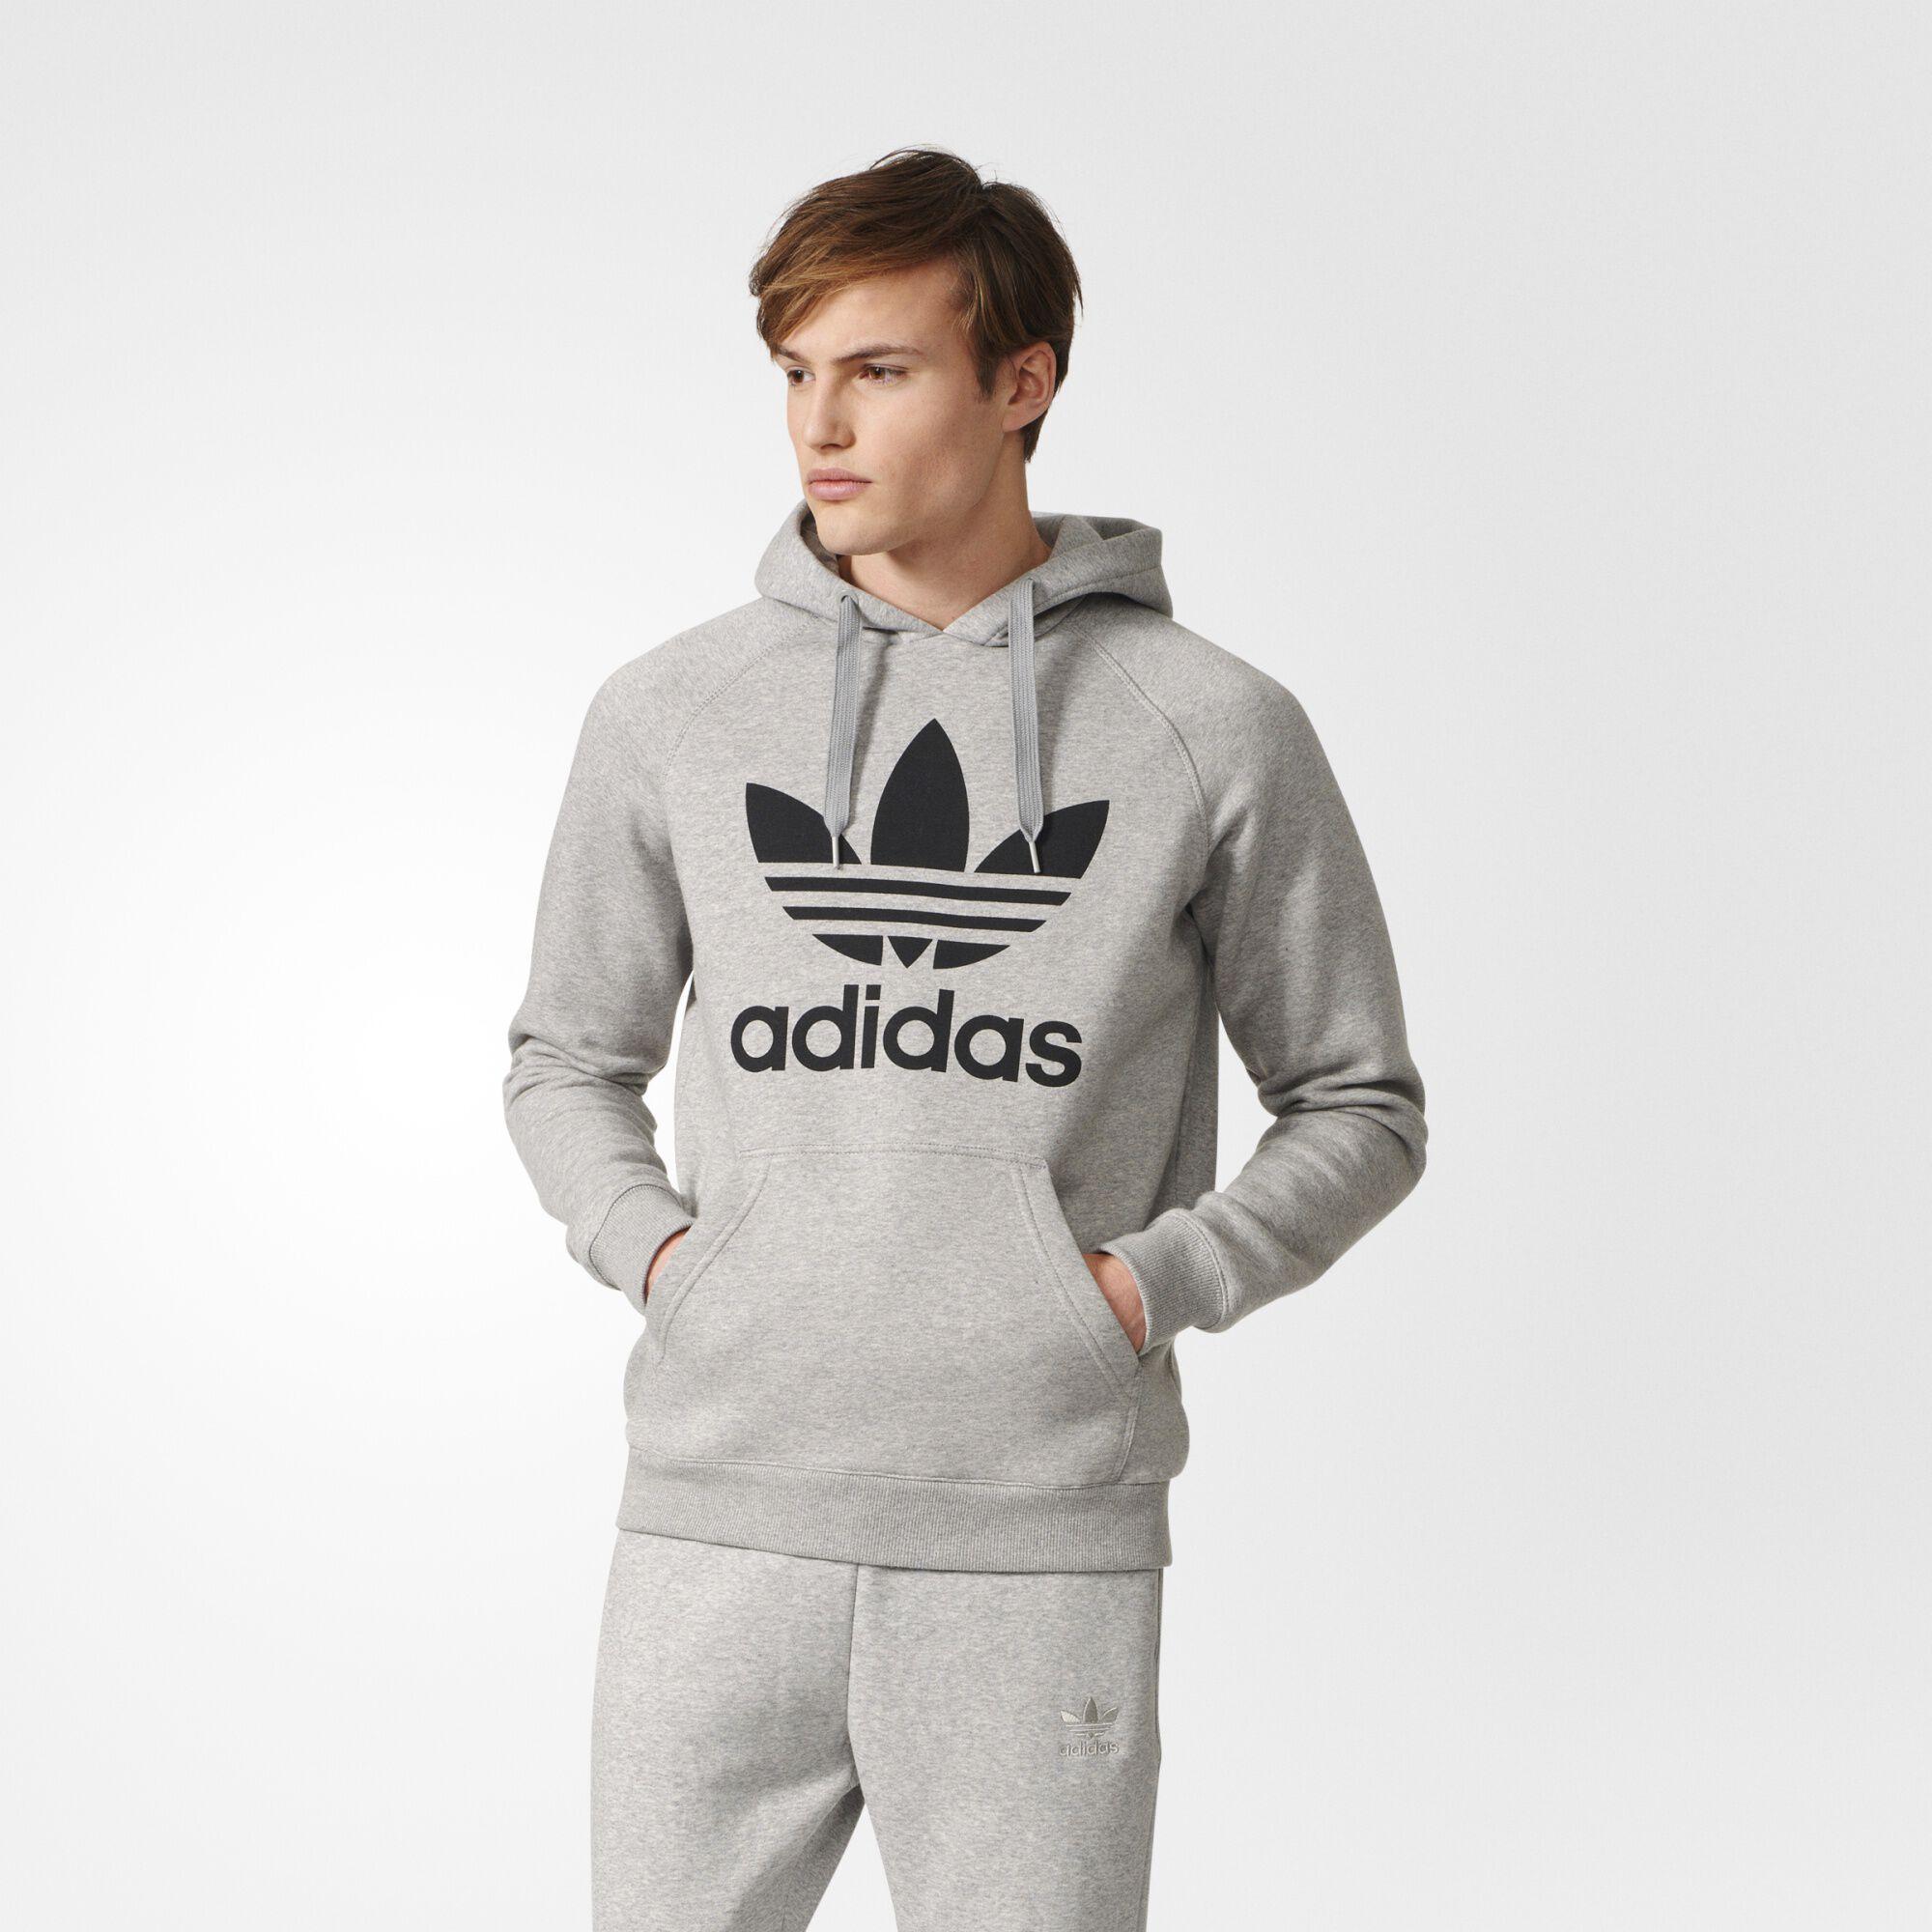 adidas originals hoodie mens on sale > OFF58% Discounted